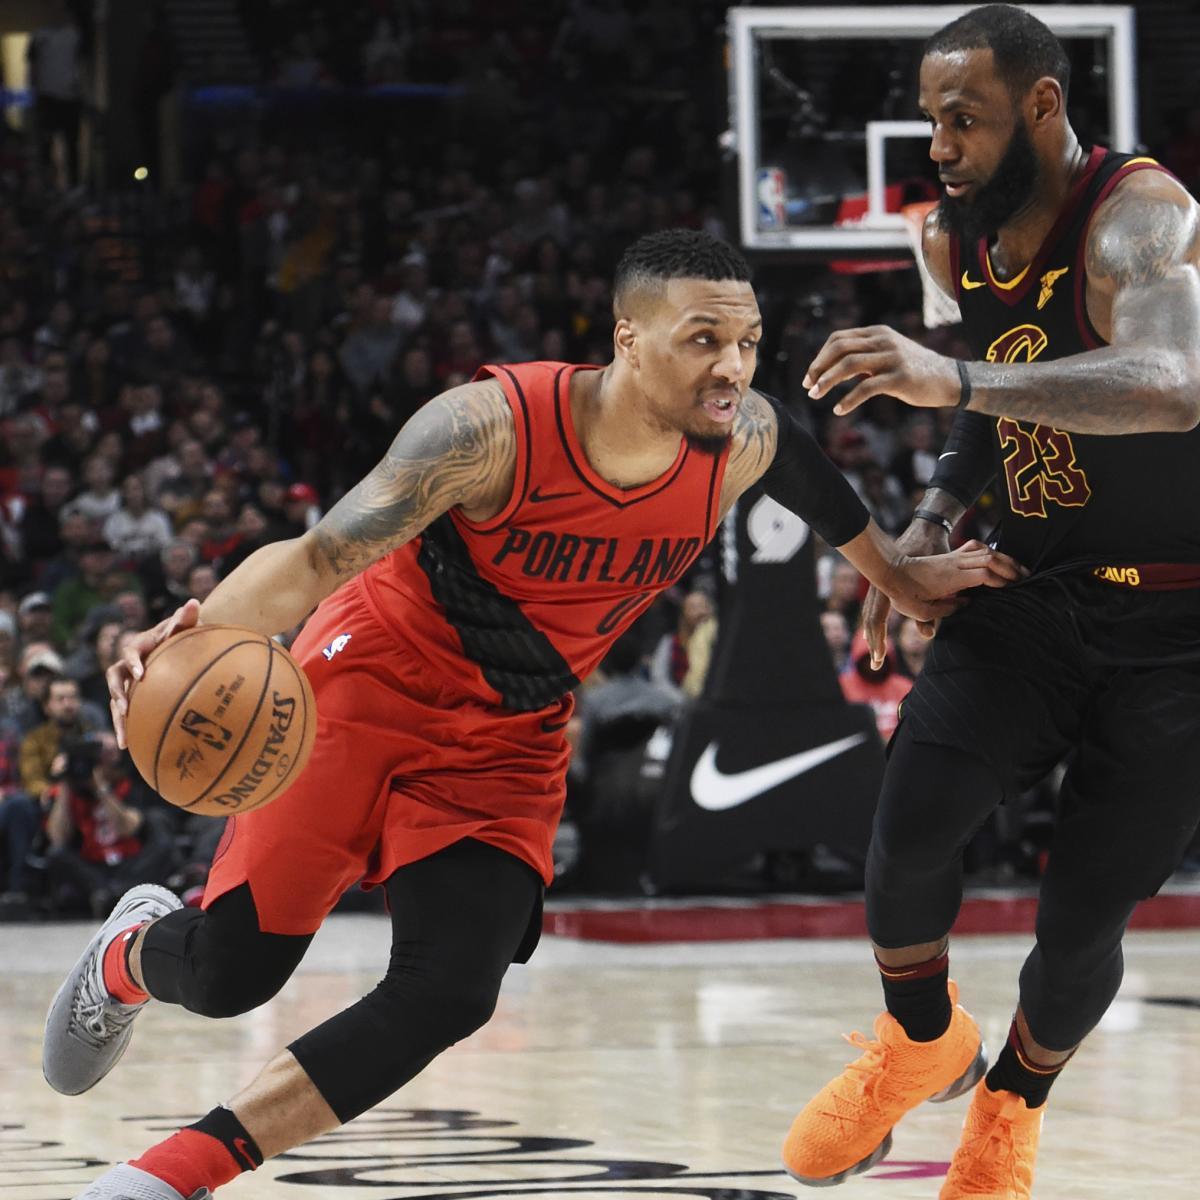 Lakers Trade Rumors: LeBron James Wants to Play with Damian Lillard